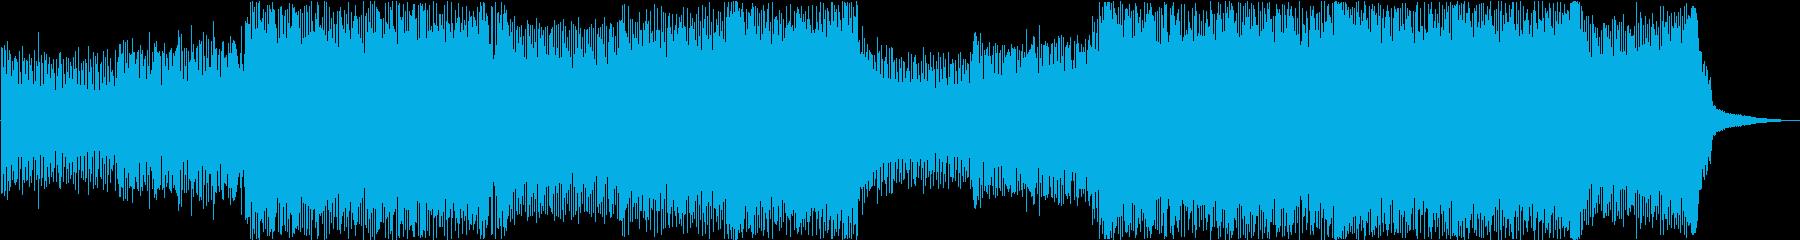 Trance  高揚感 EDM 疾走感の再生済みの波形